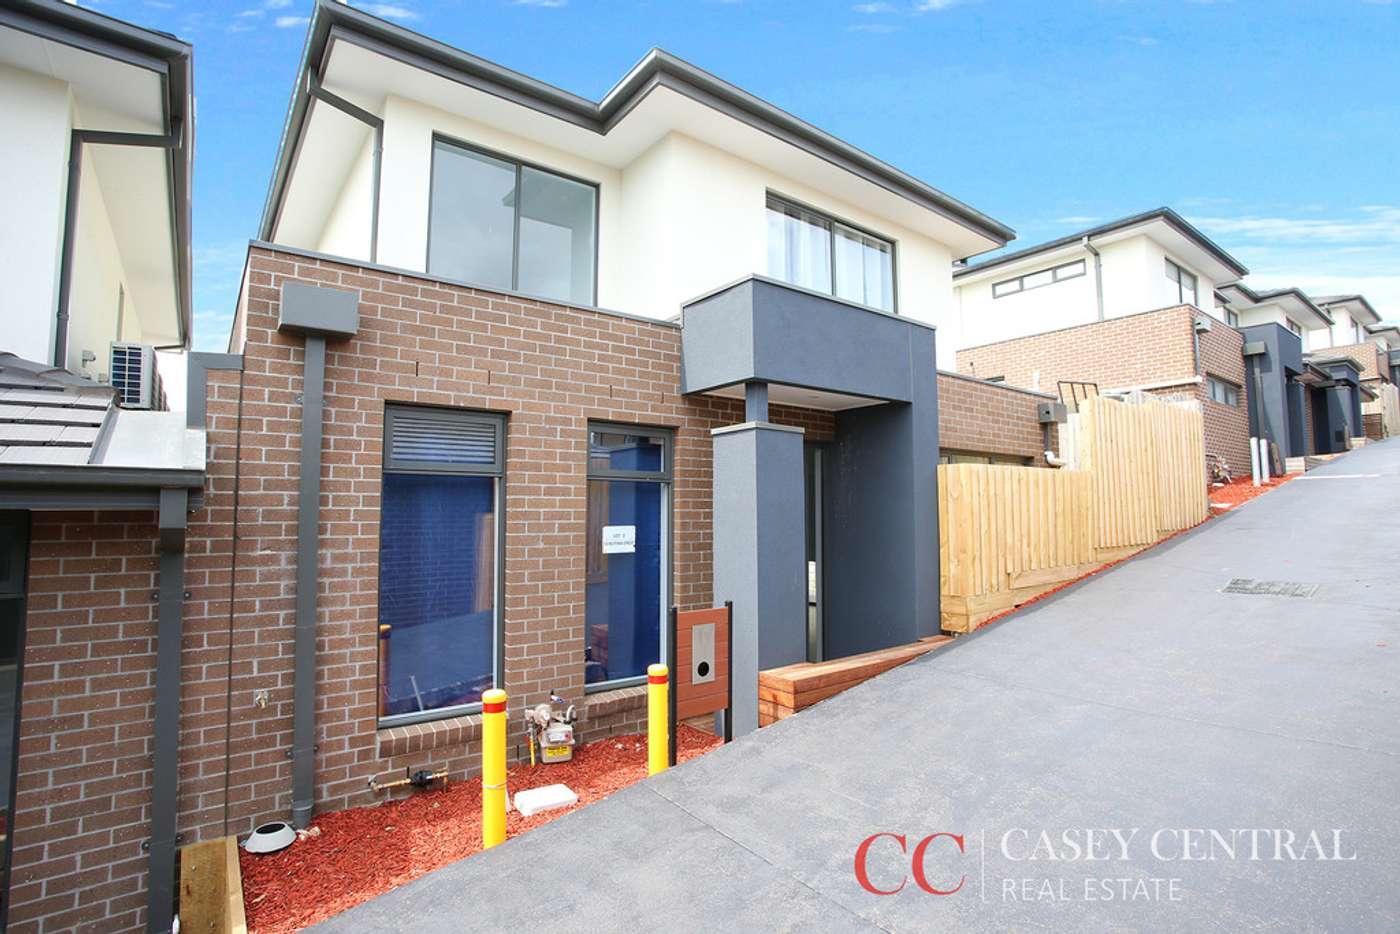 Main view of Homely house listing, 10 Butina Crest, Pakenham VIC 3810